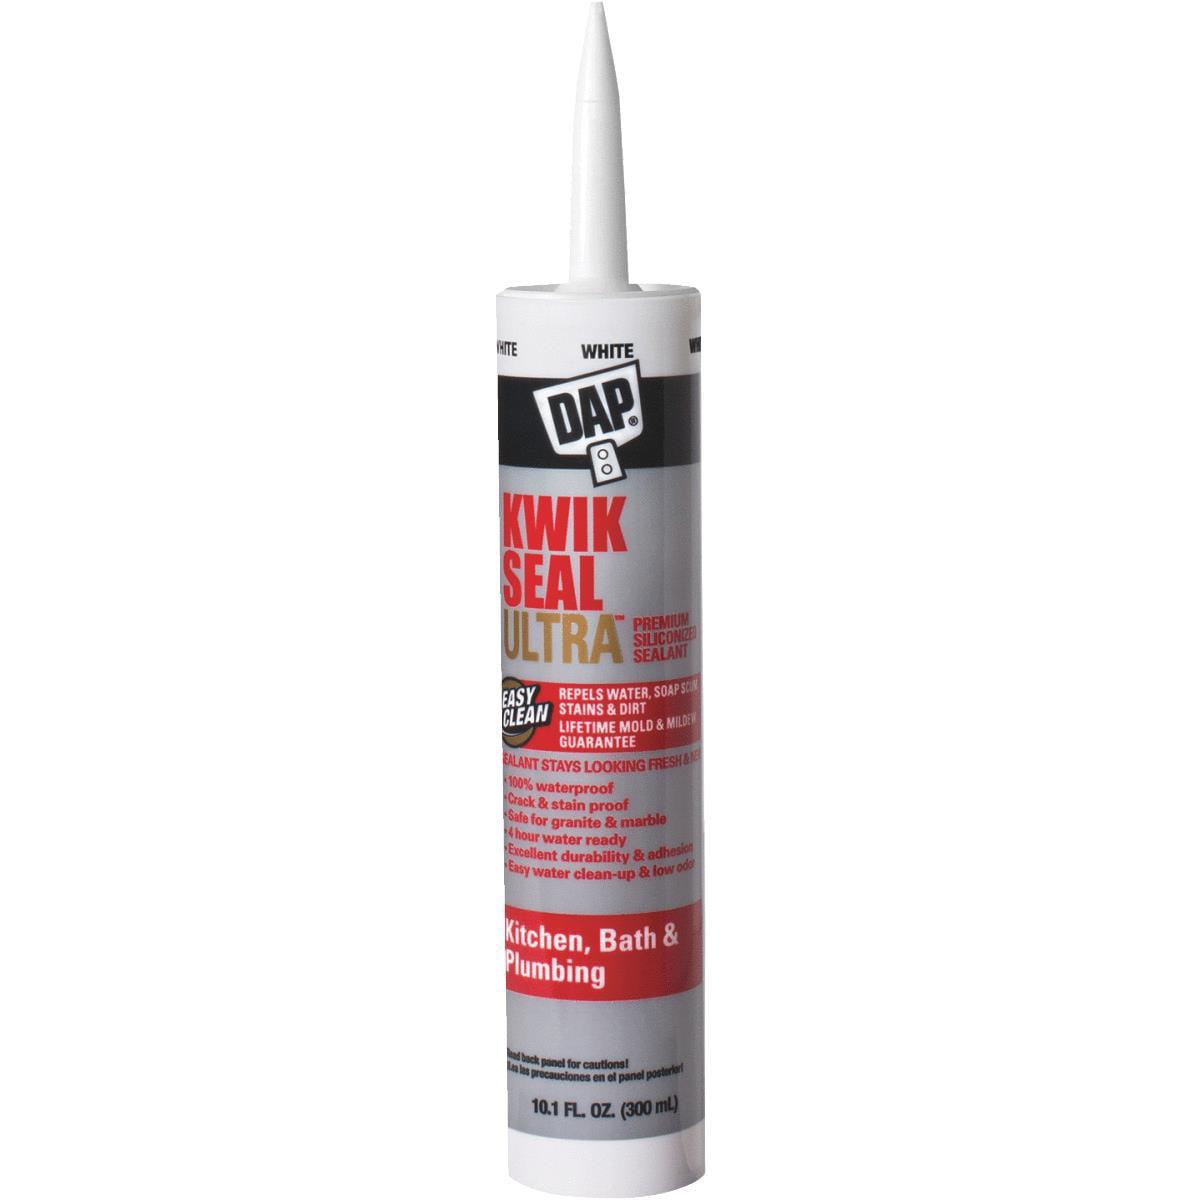 DAP Kwik Seal Ultra Premium Kitchen and Bath Sealant, 10.1 oz White